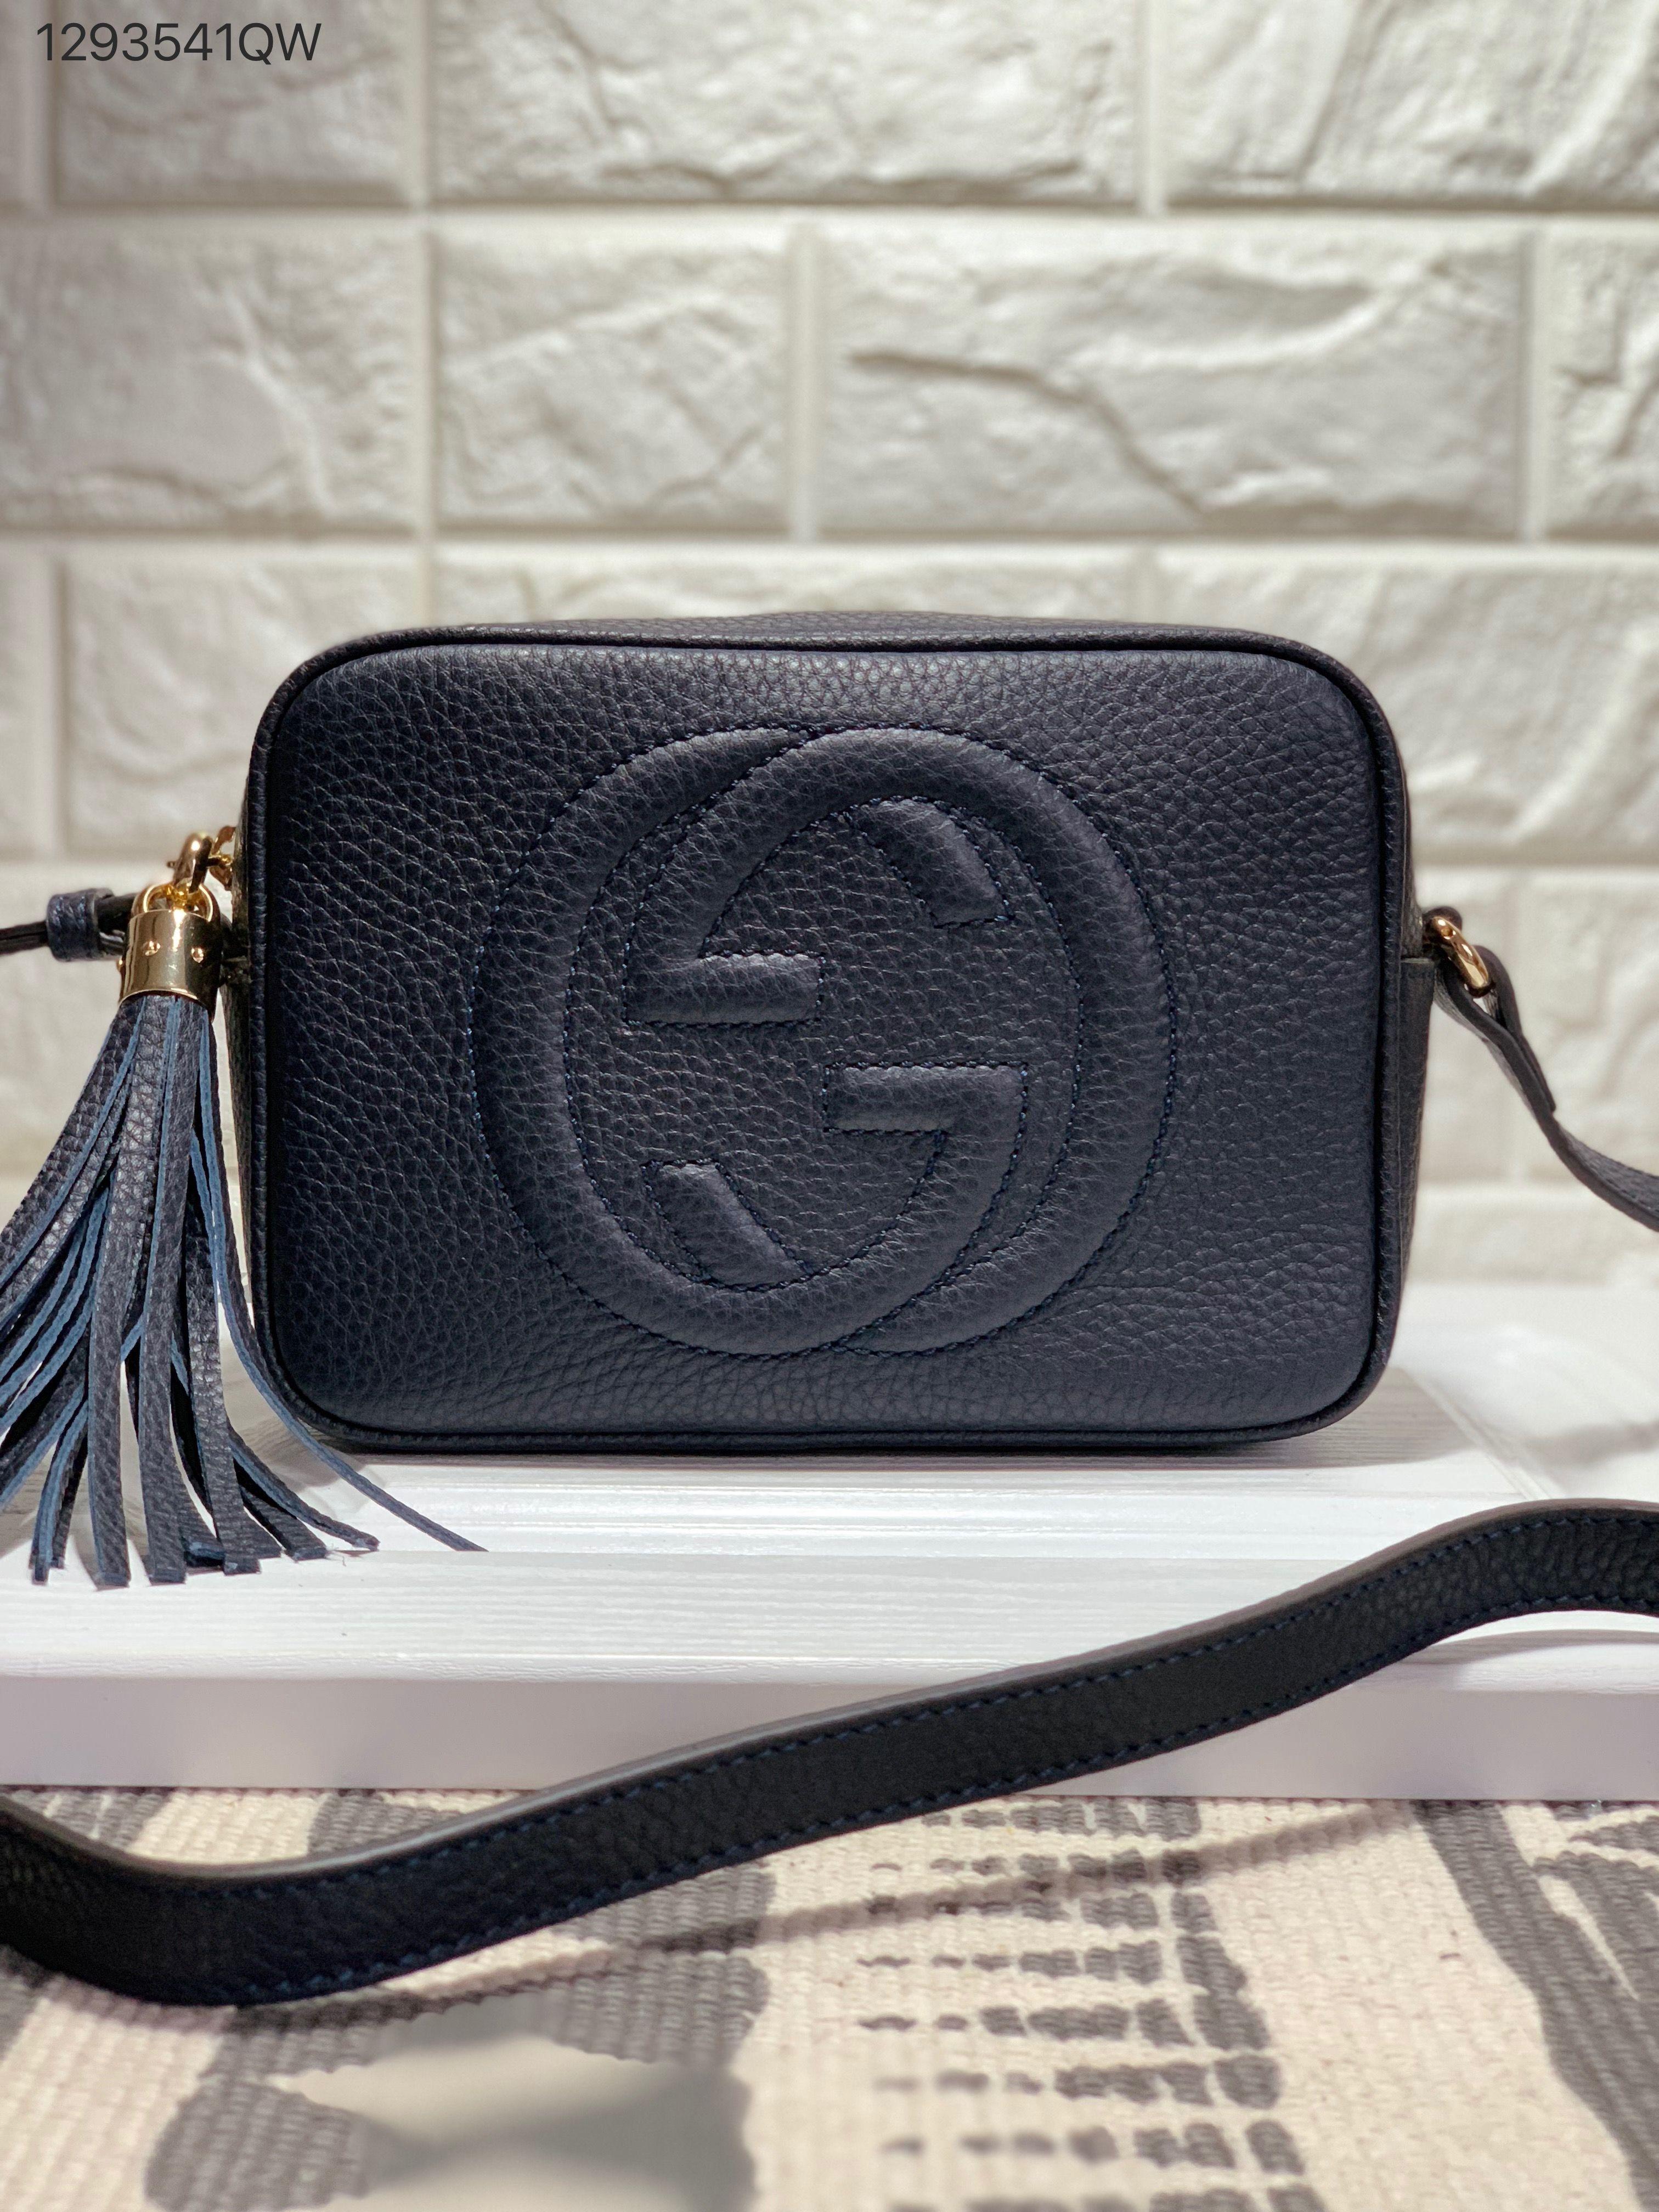 b2065c0d724d Gucci soho disco cross body camera bag navy blue | Gucci bags in ...